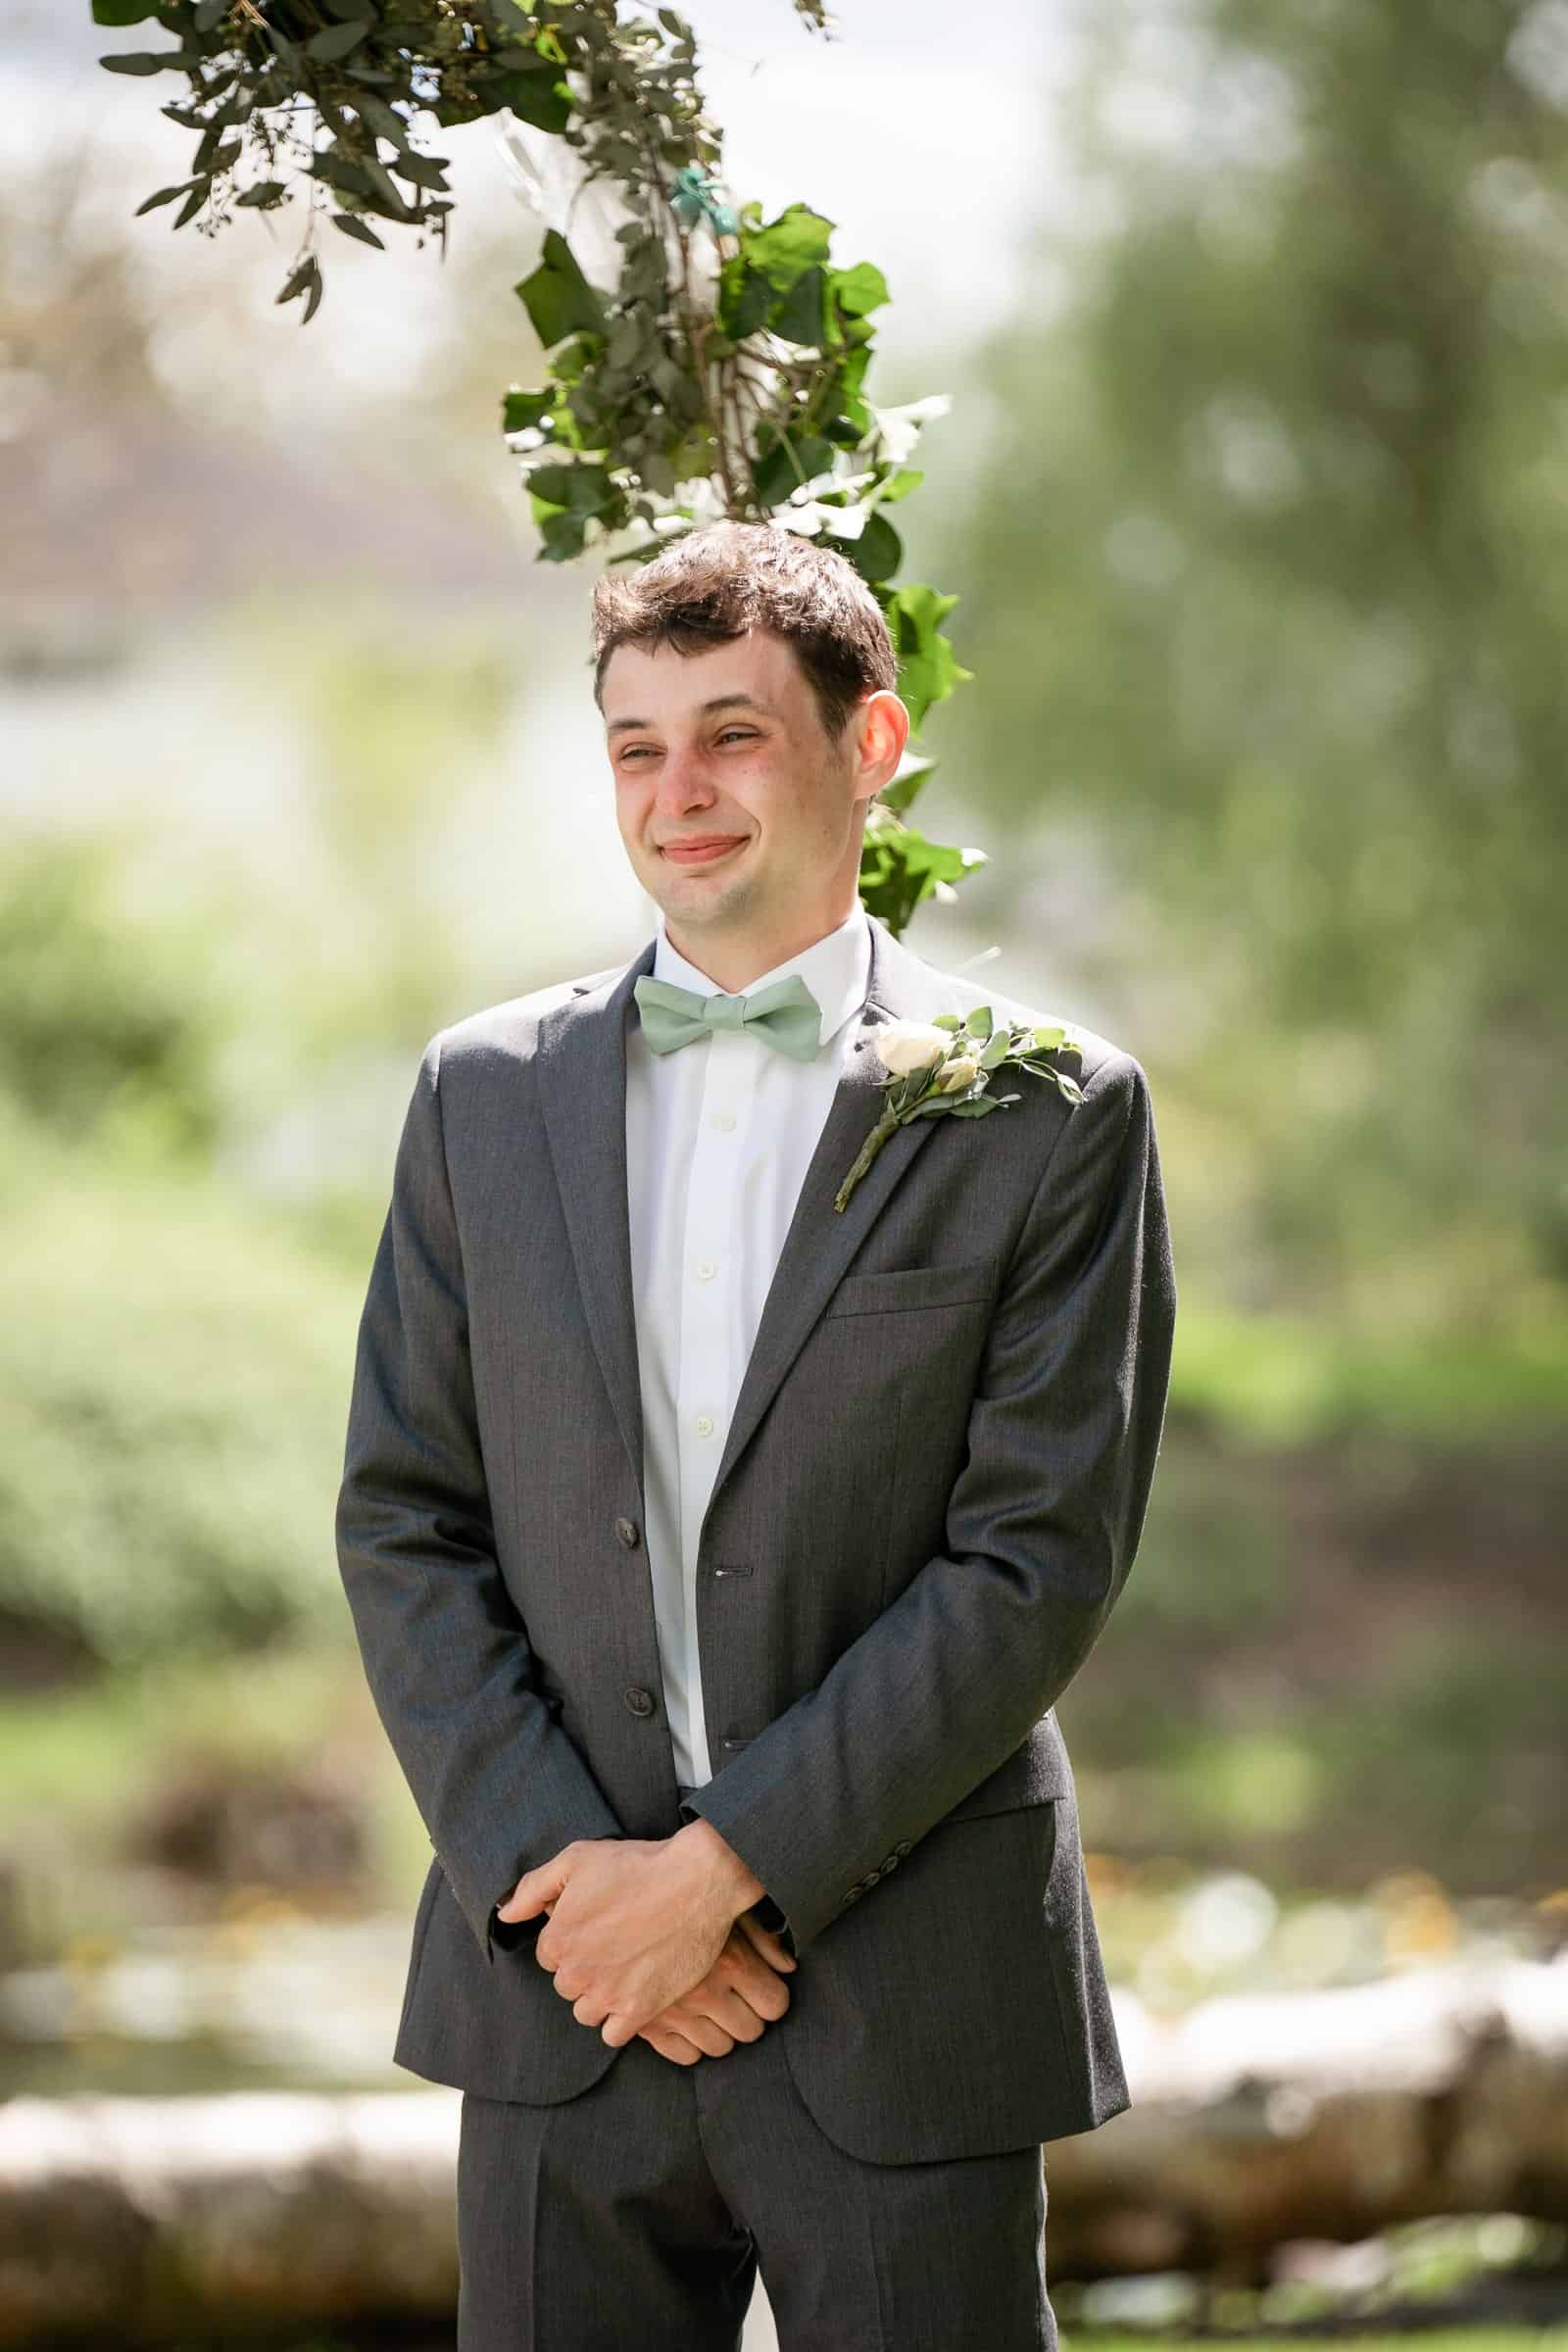 emotional groom watching bride come down aisle